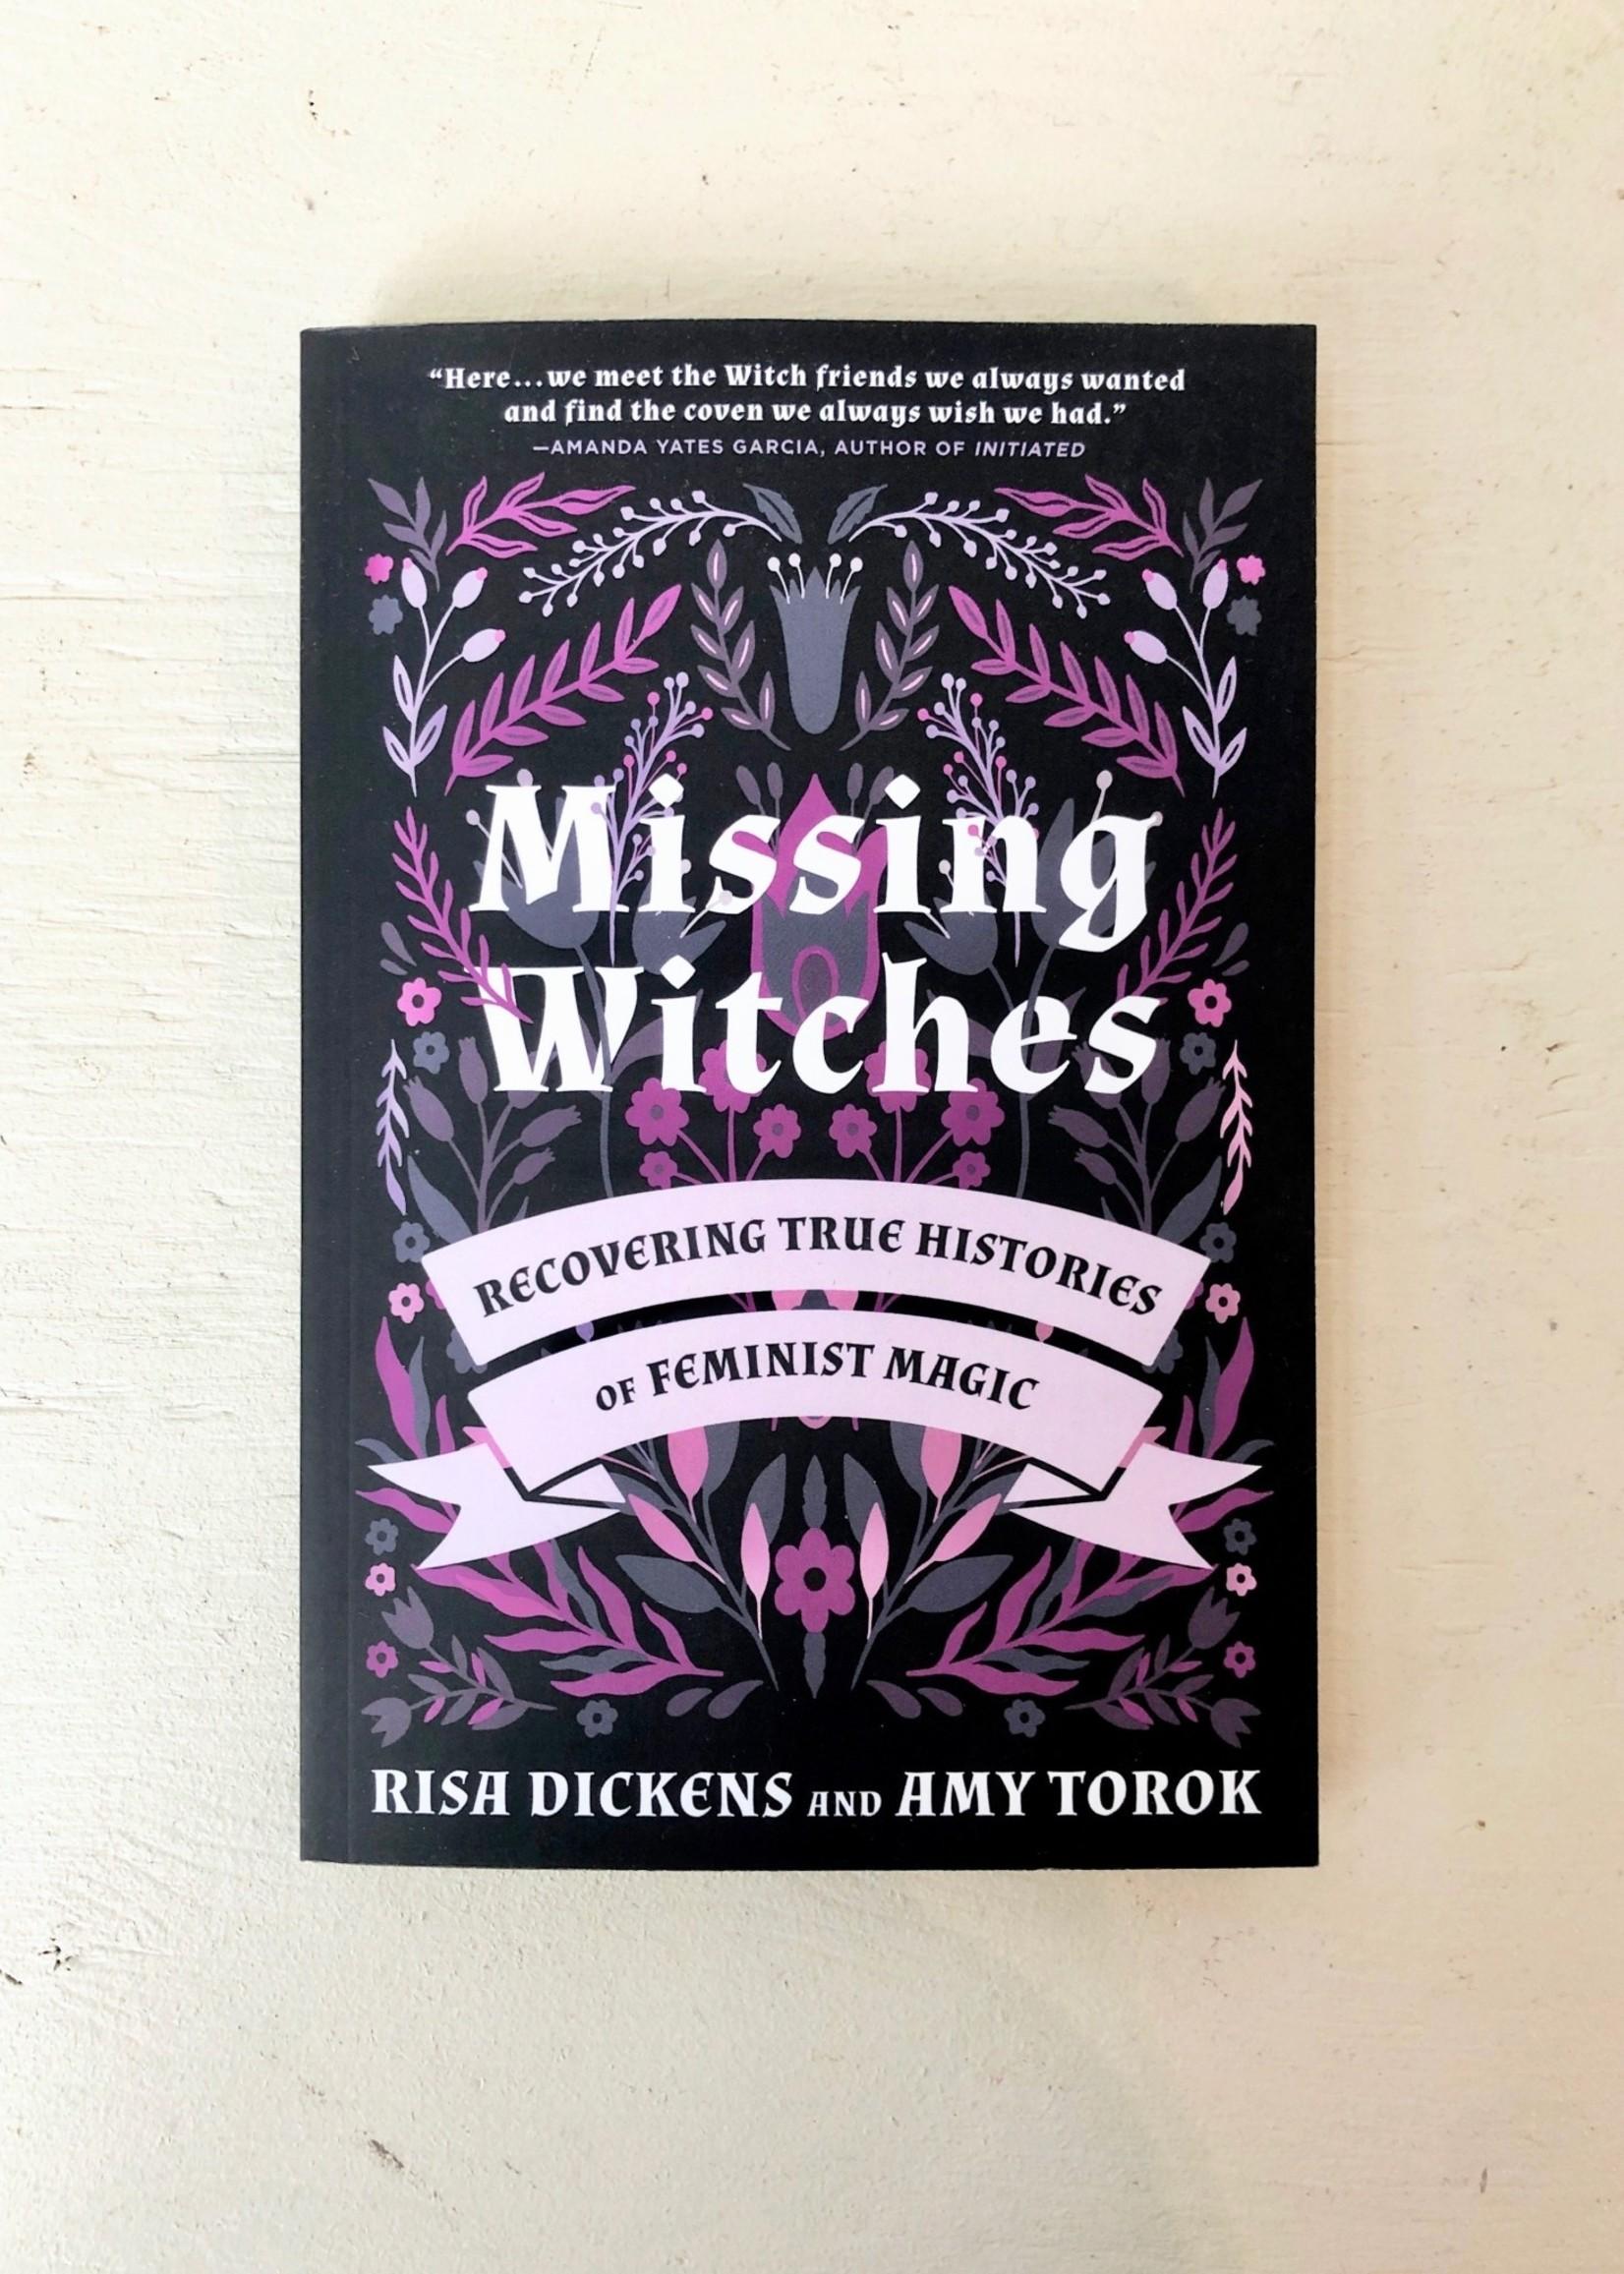 "Risa Dickens and Amy Torok ""Missing Witches"" par Rita Dickens et Amy Torok"